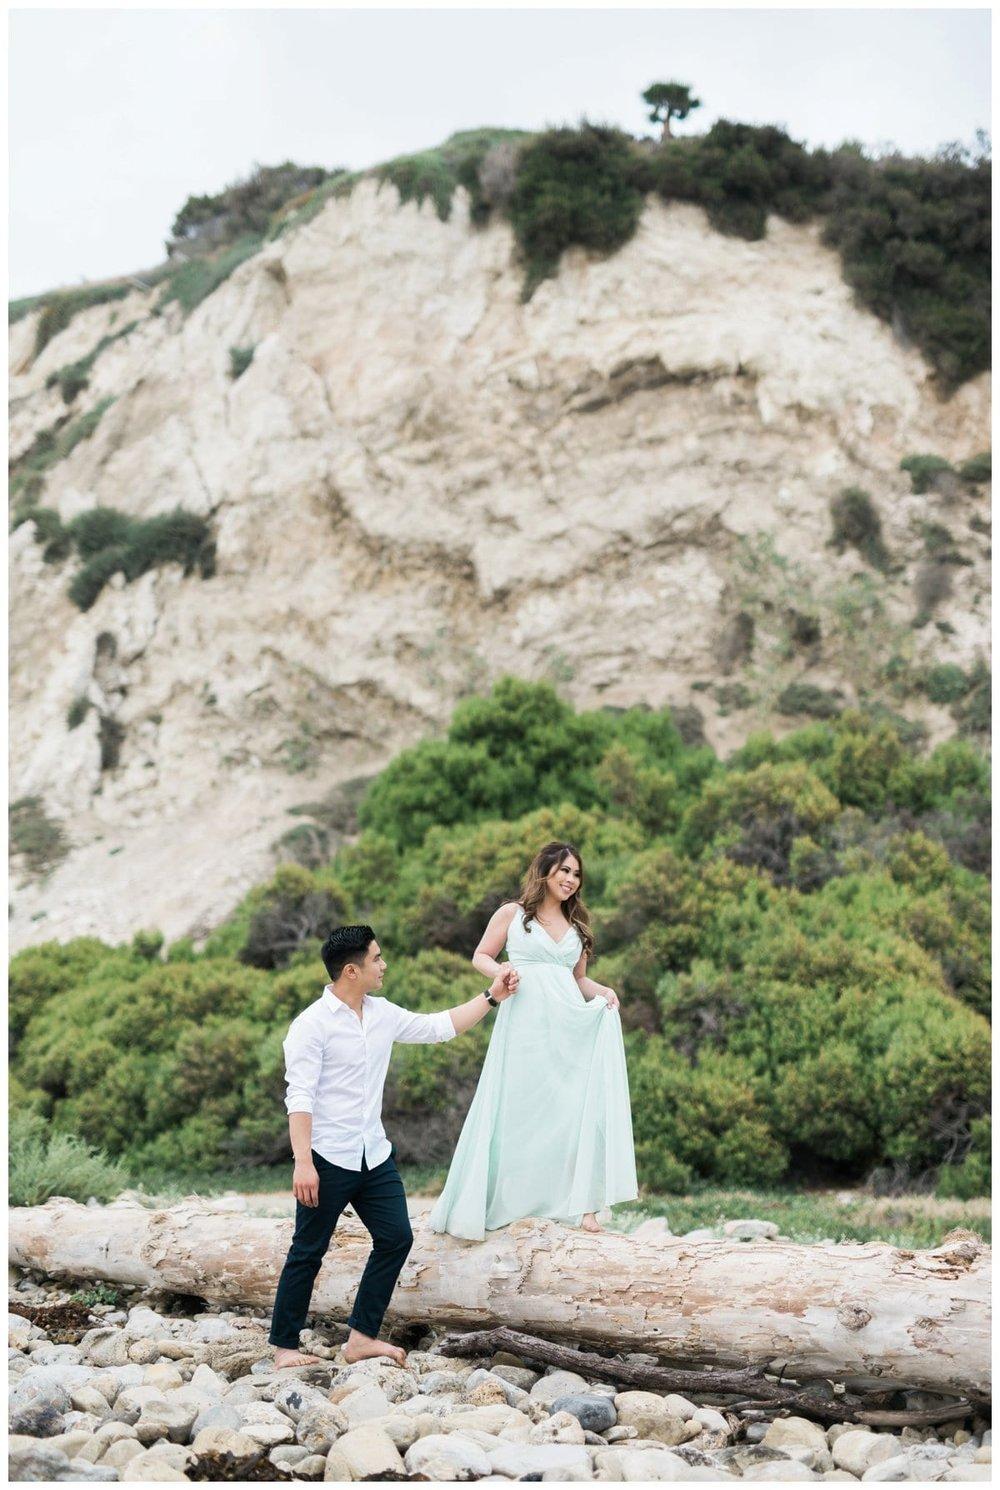 Amanda-Thierry-Palos-Verdes-Engagement-Carissa-Woo-Photography_0025.jpg